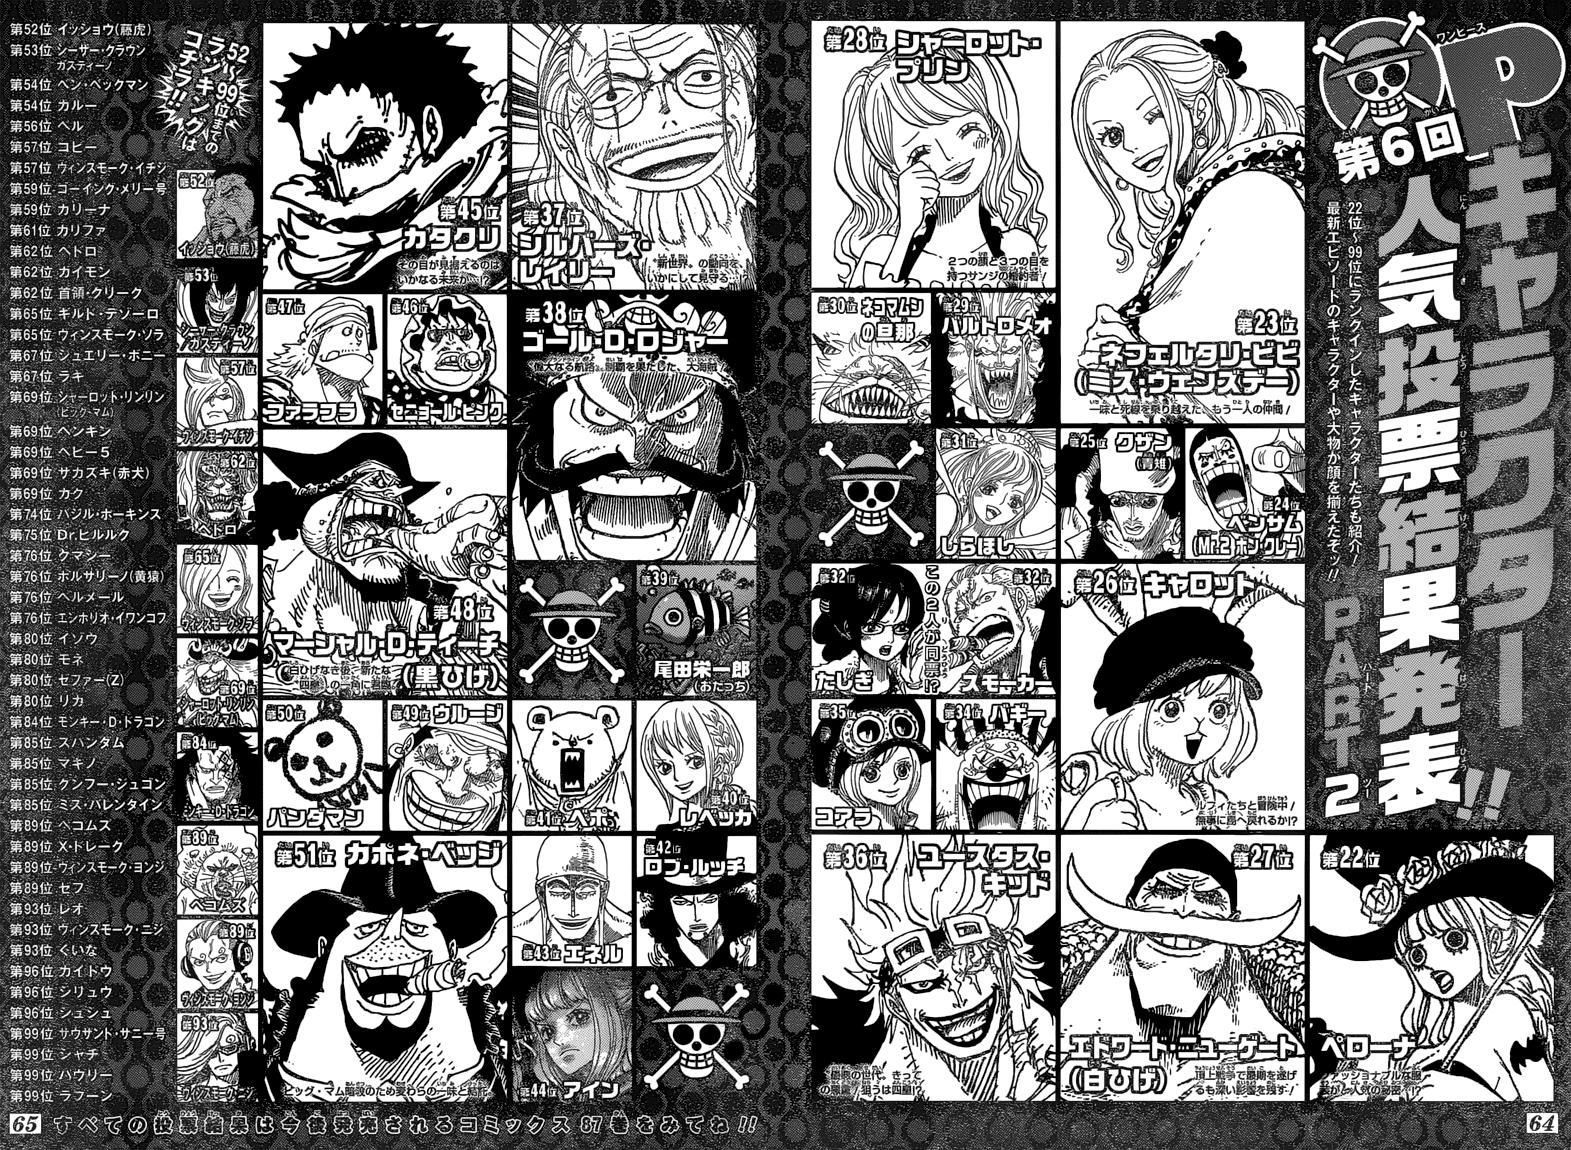 Read Manga One Piece One Piece 874 Online In High Quality One Piece Funny Manga Manga To Read